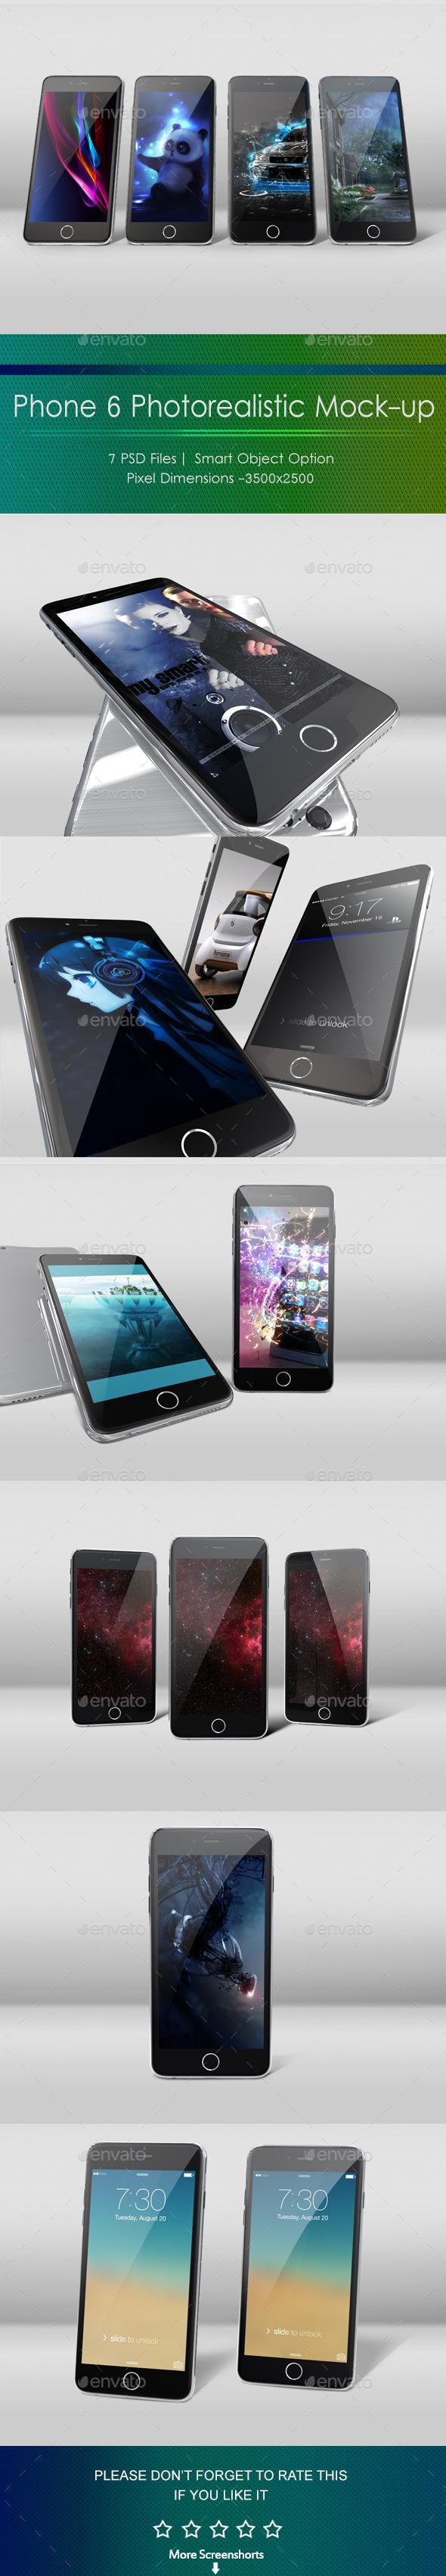 Phone 6 Photorealistic Mockup